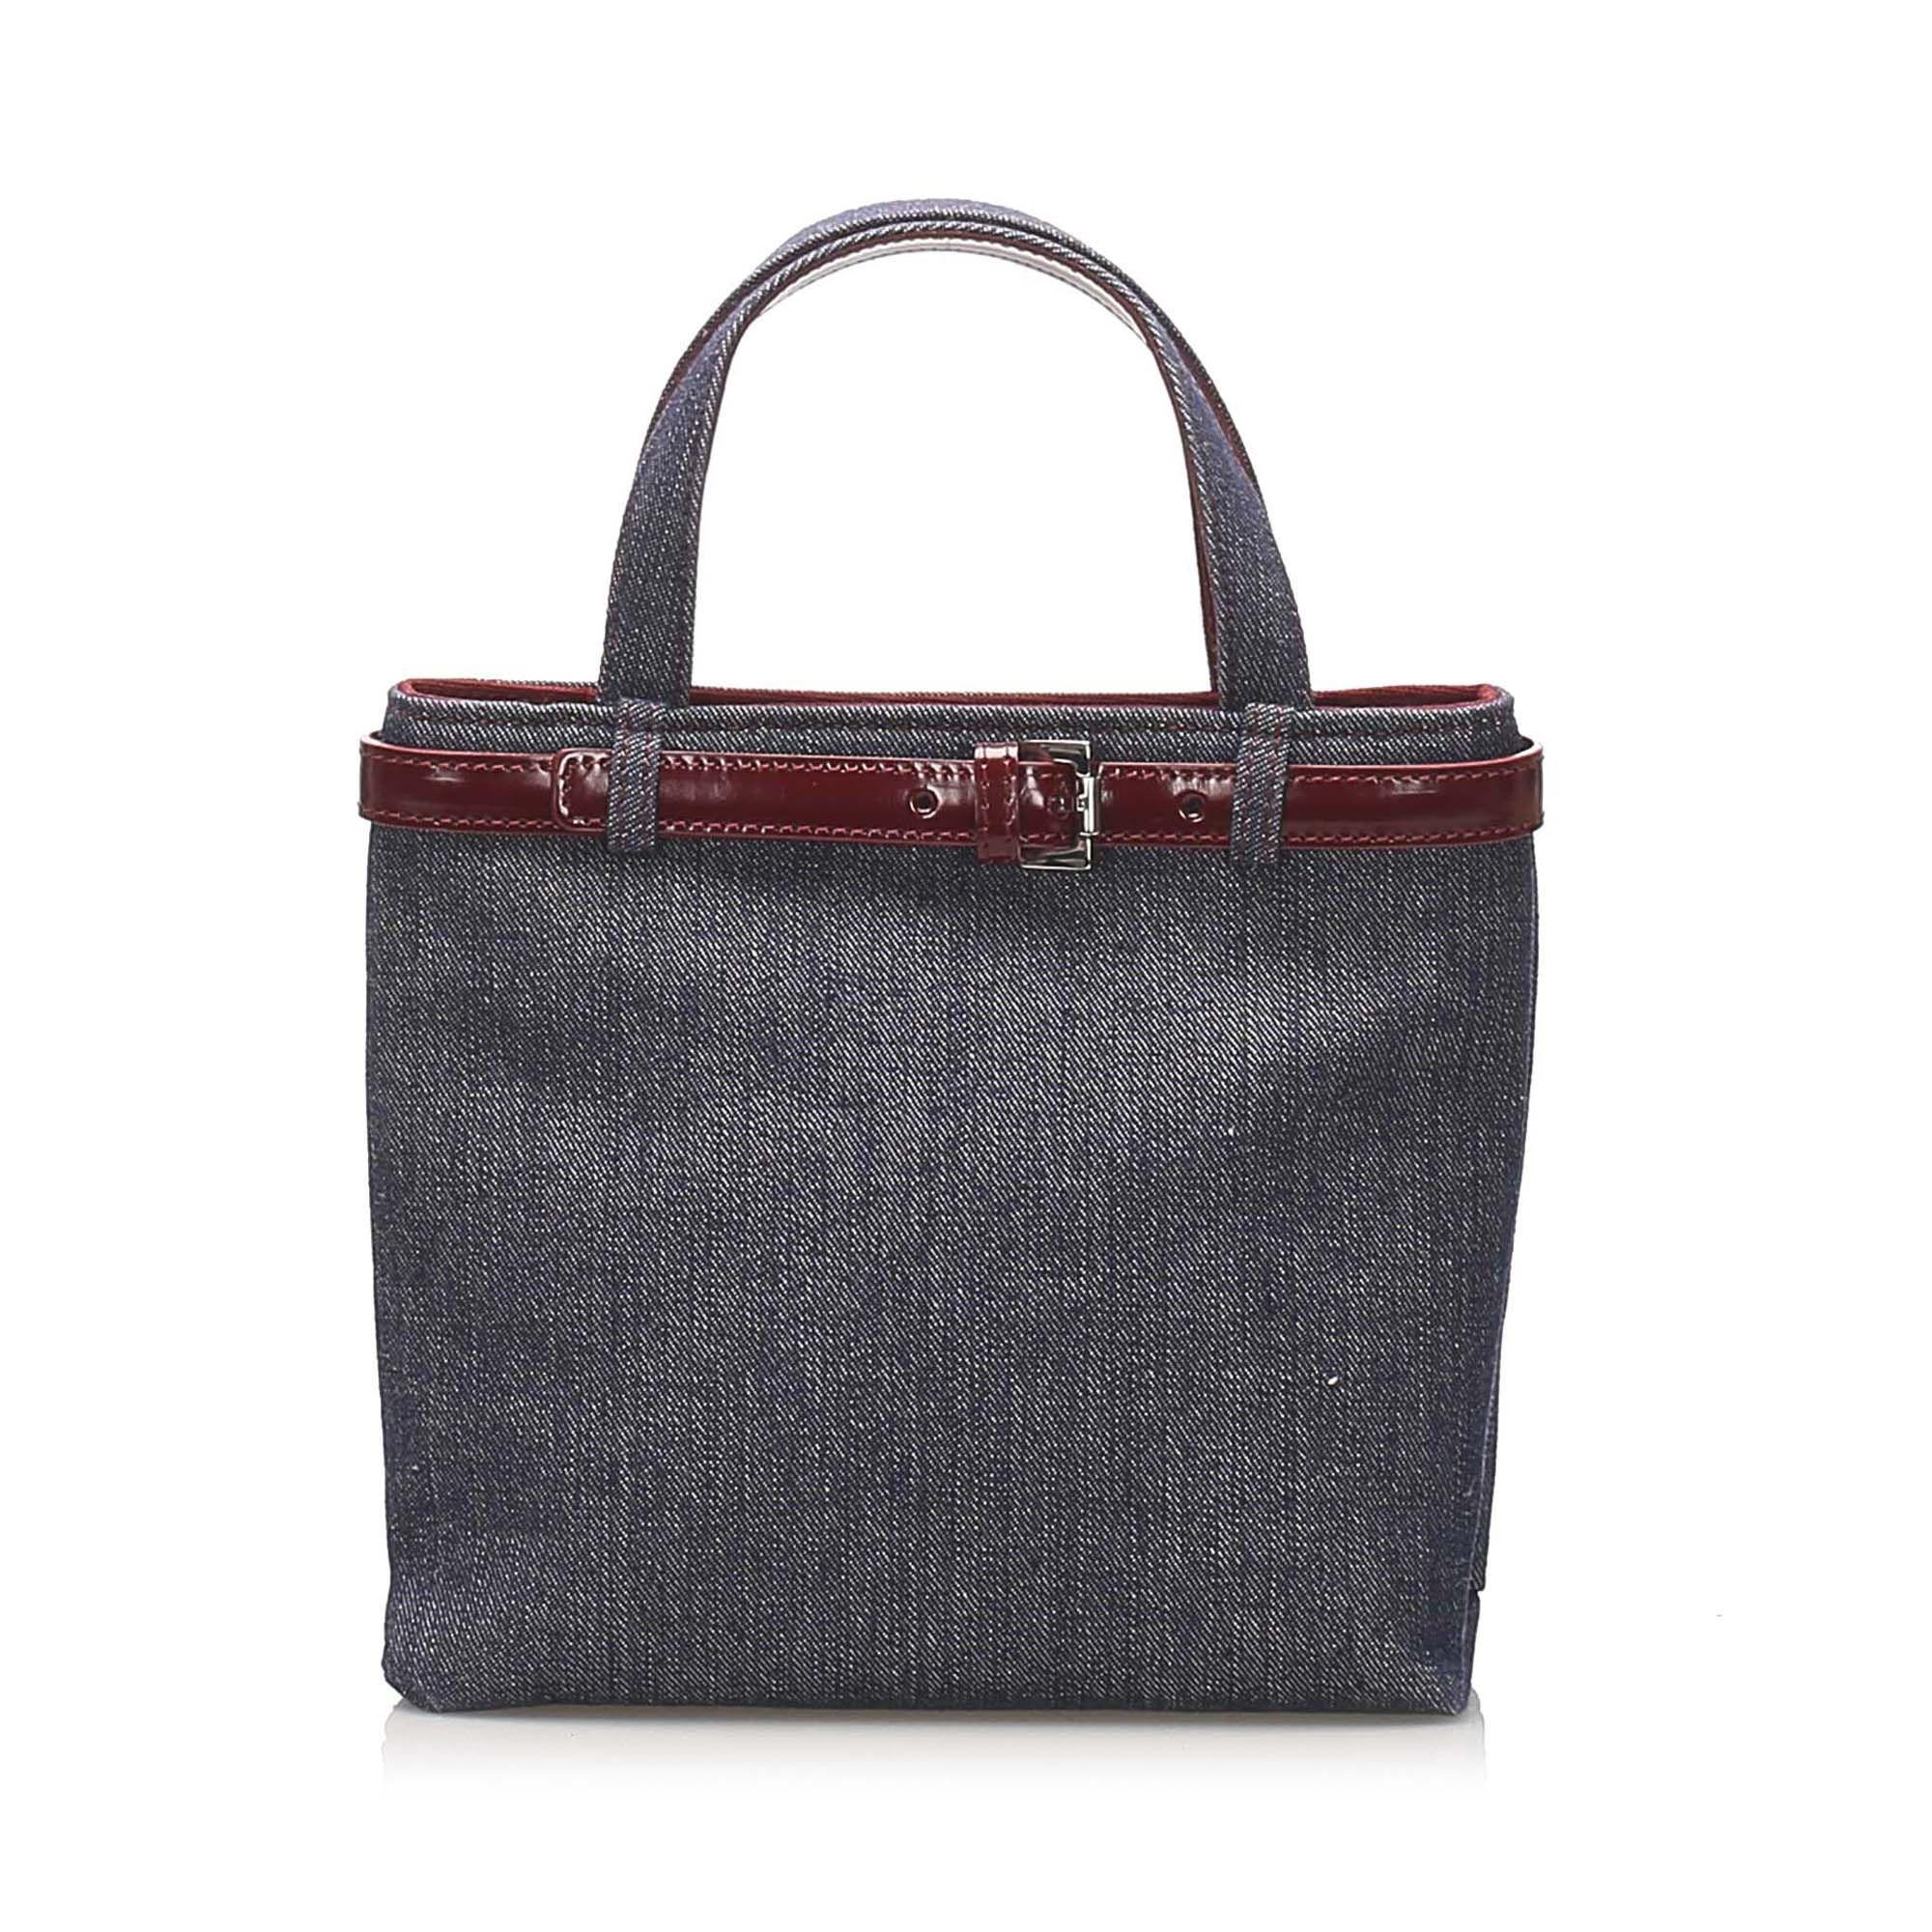 Vintage Burberry Denim Handbag Blue